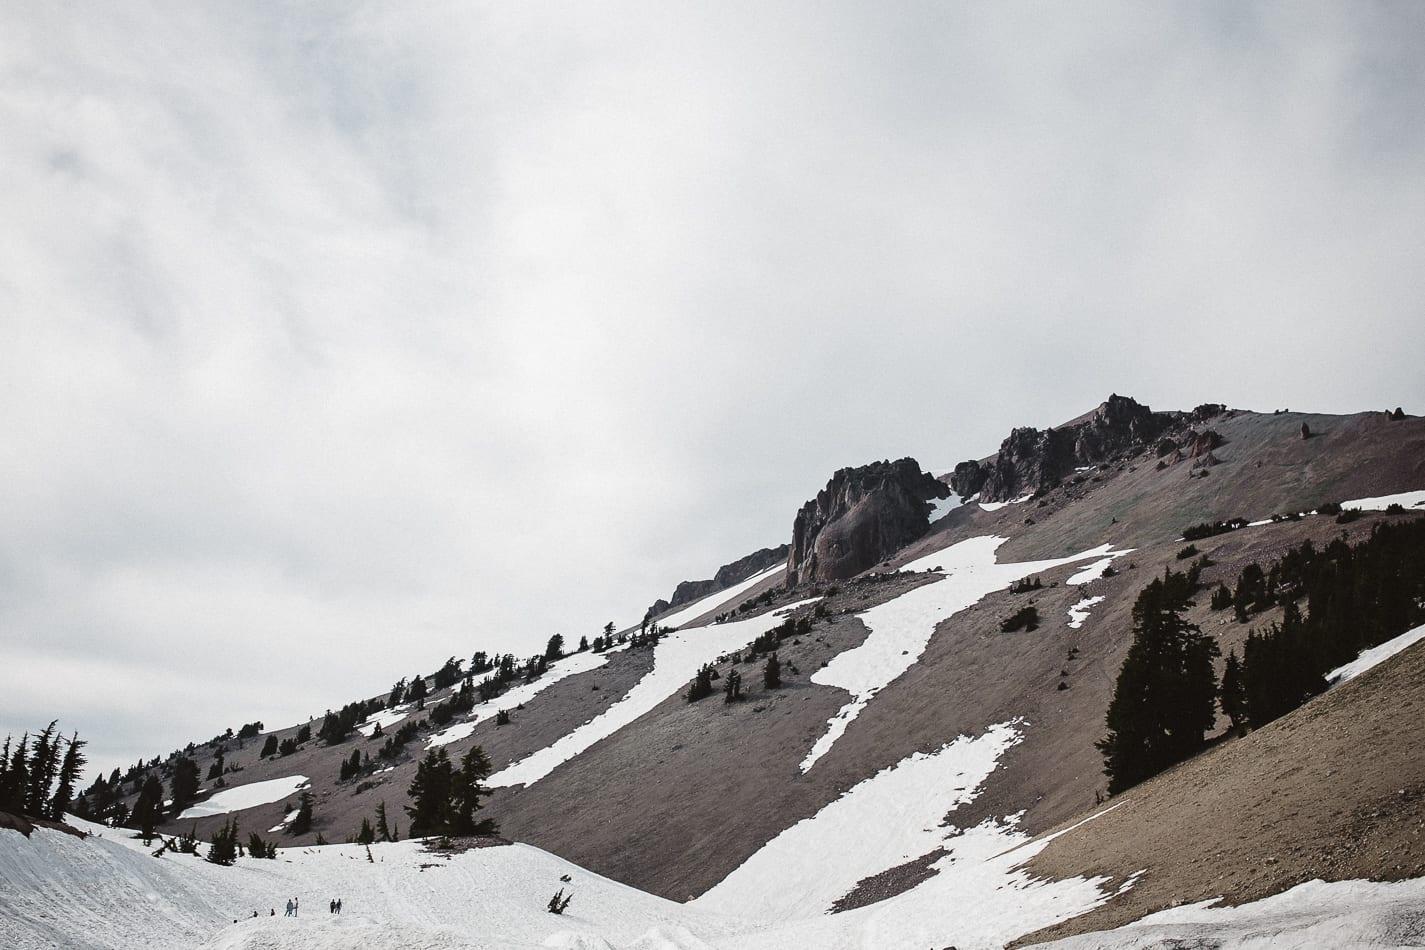 mount-lassen-california-adventure-lifestyle-photorapher-12